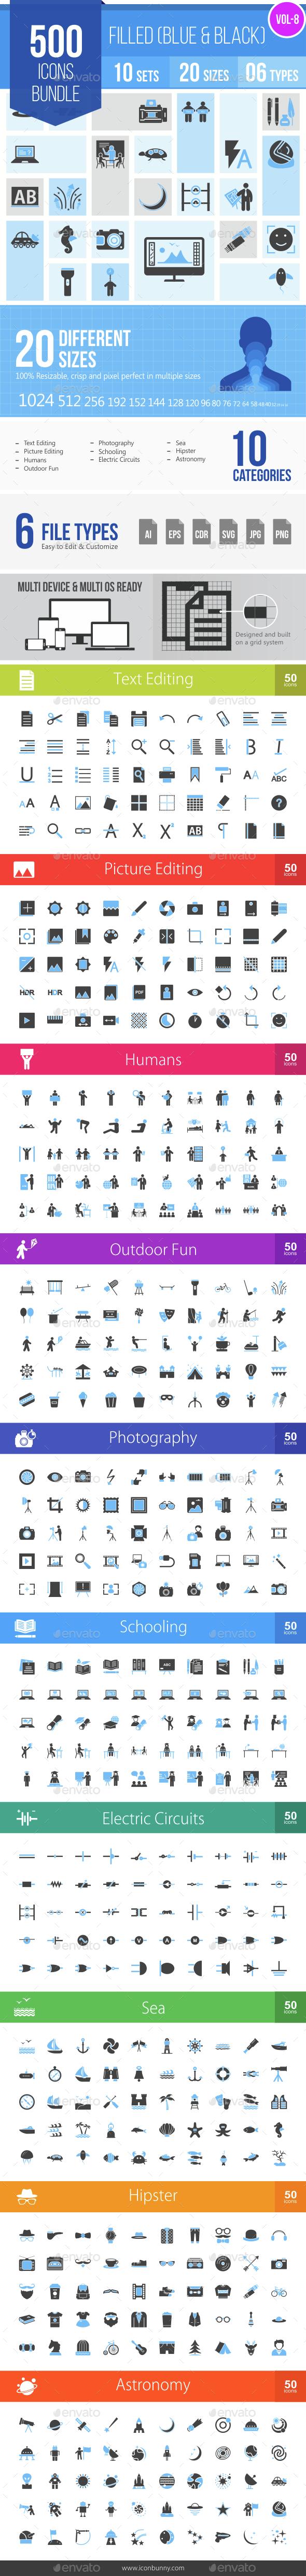 500 Vector Blue & Black Filled Icons Bundle (Vol-8) - Icons